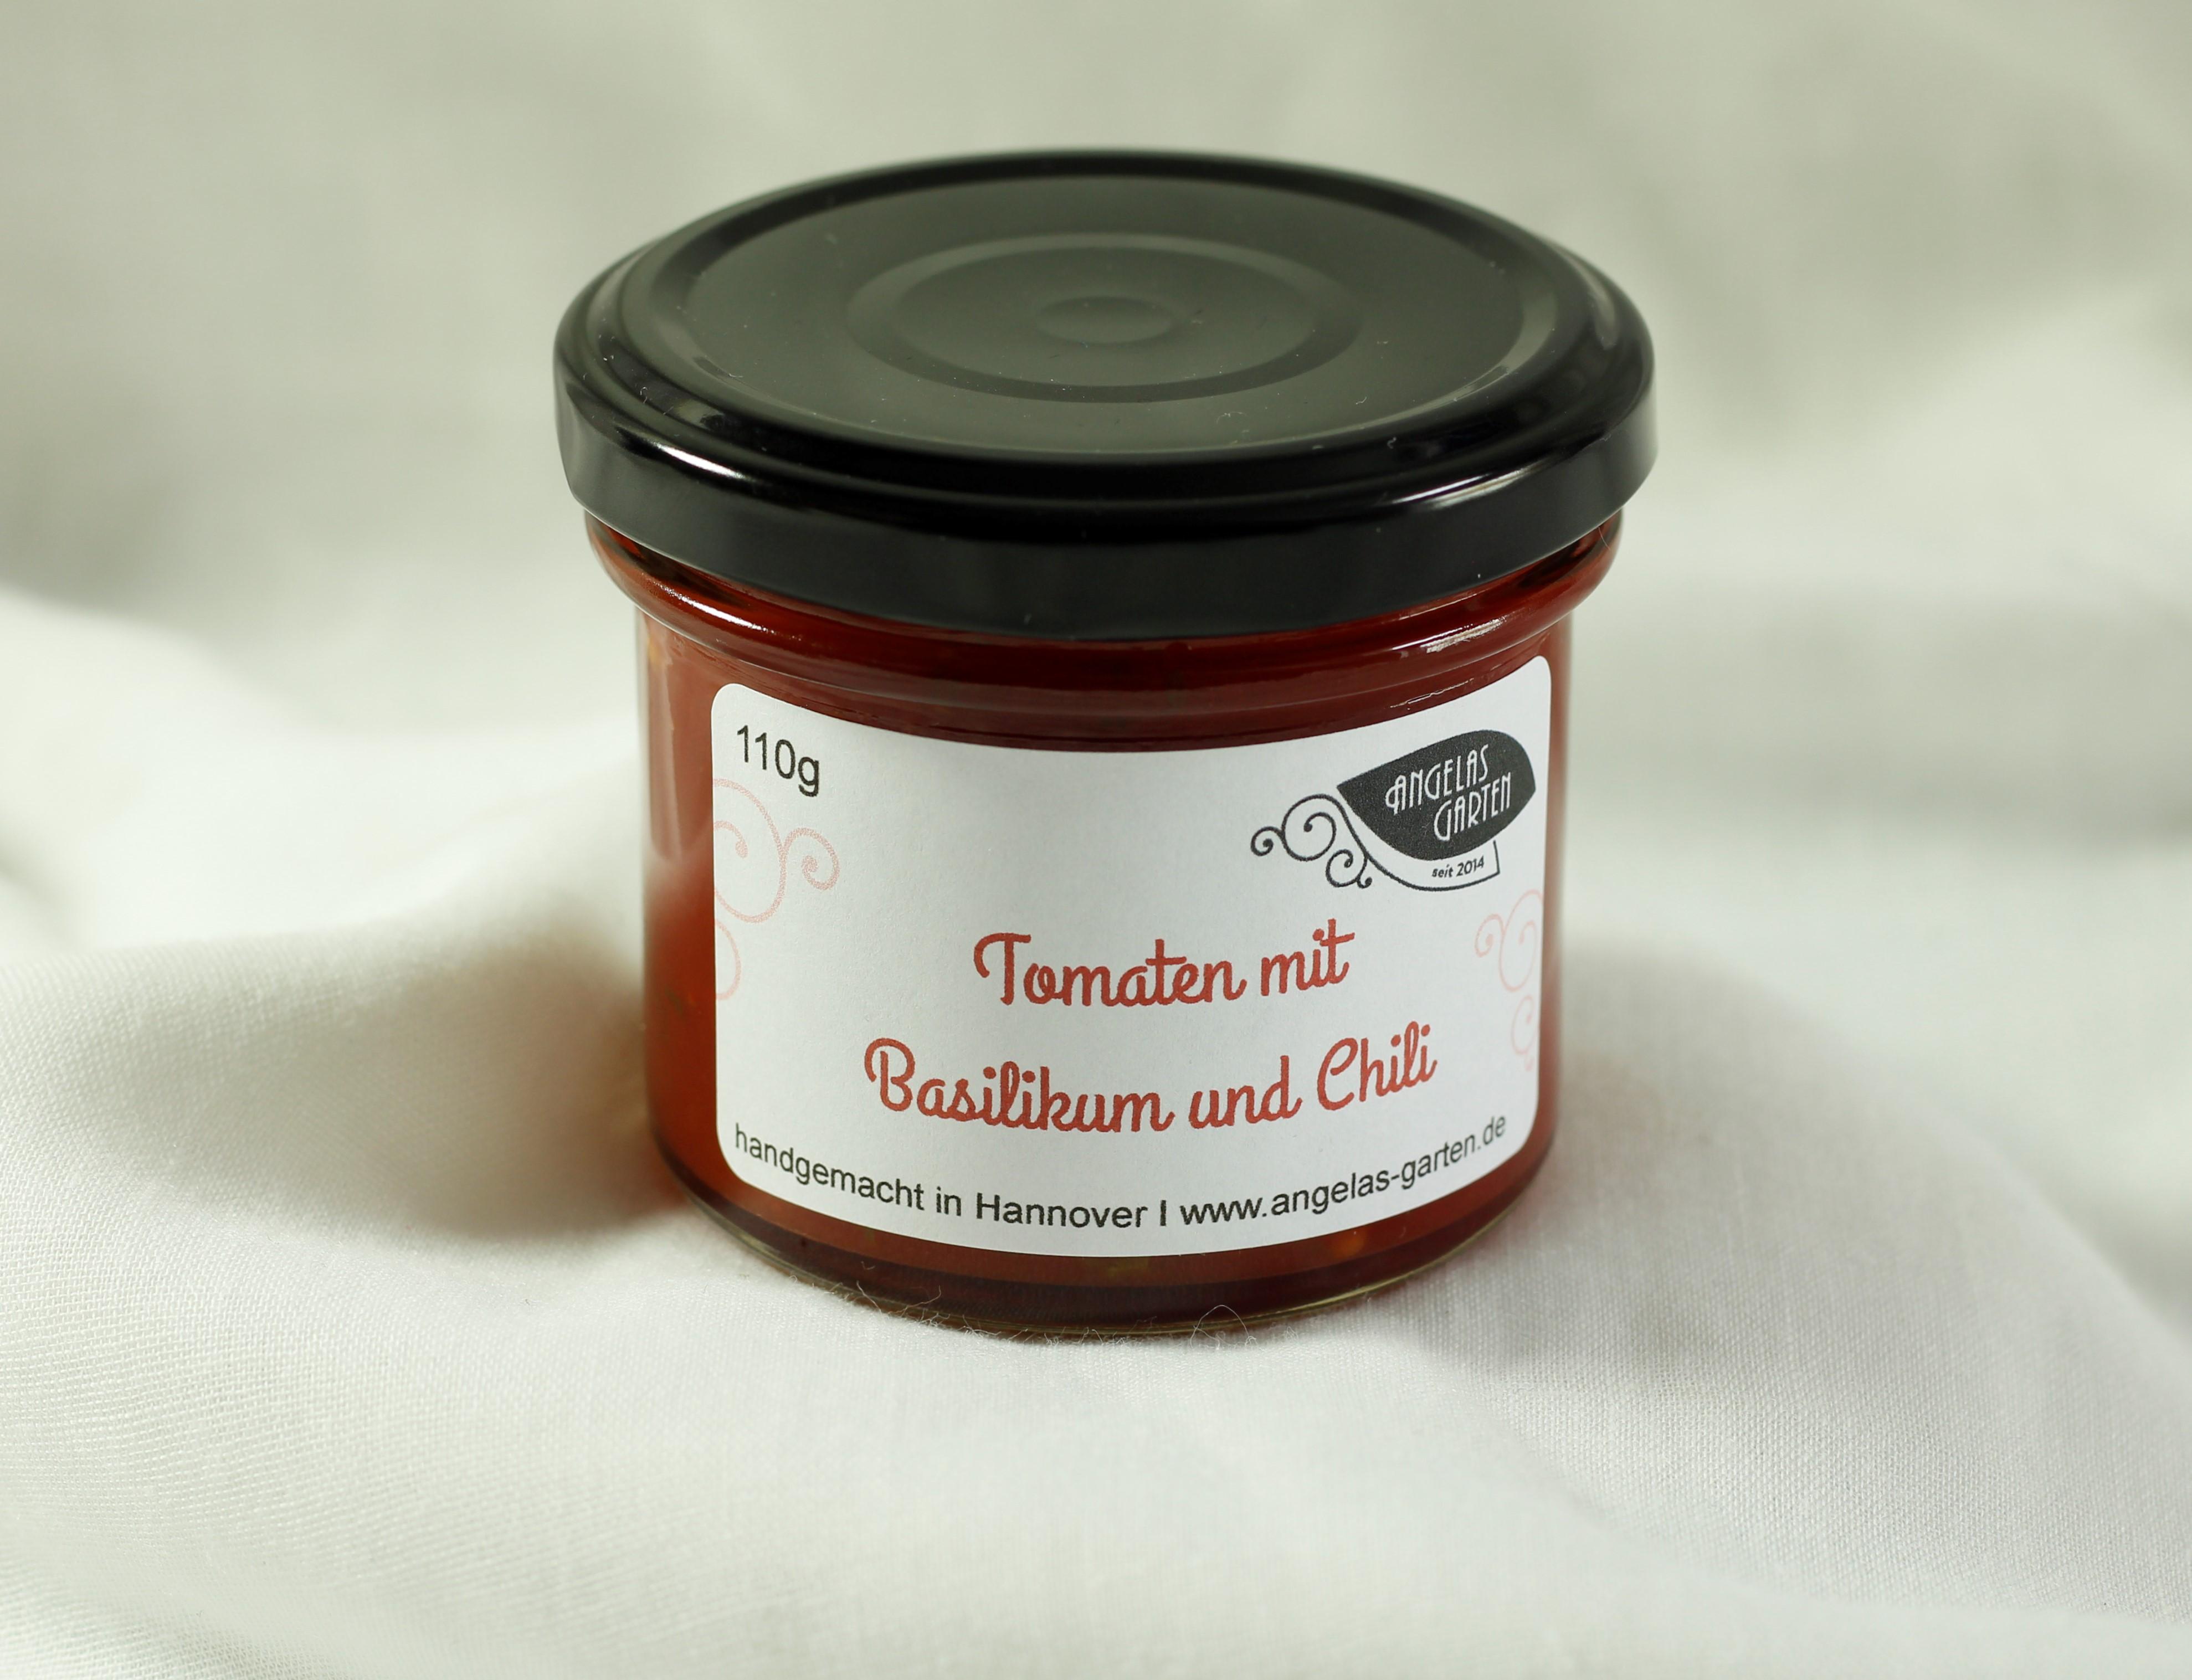 Tomate-Basilikum mit Chili 110g